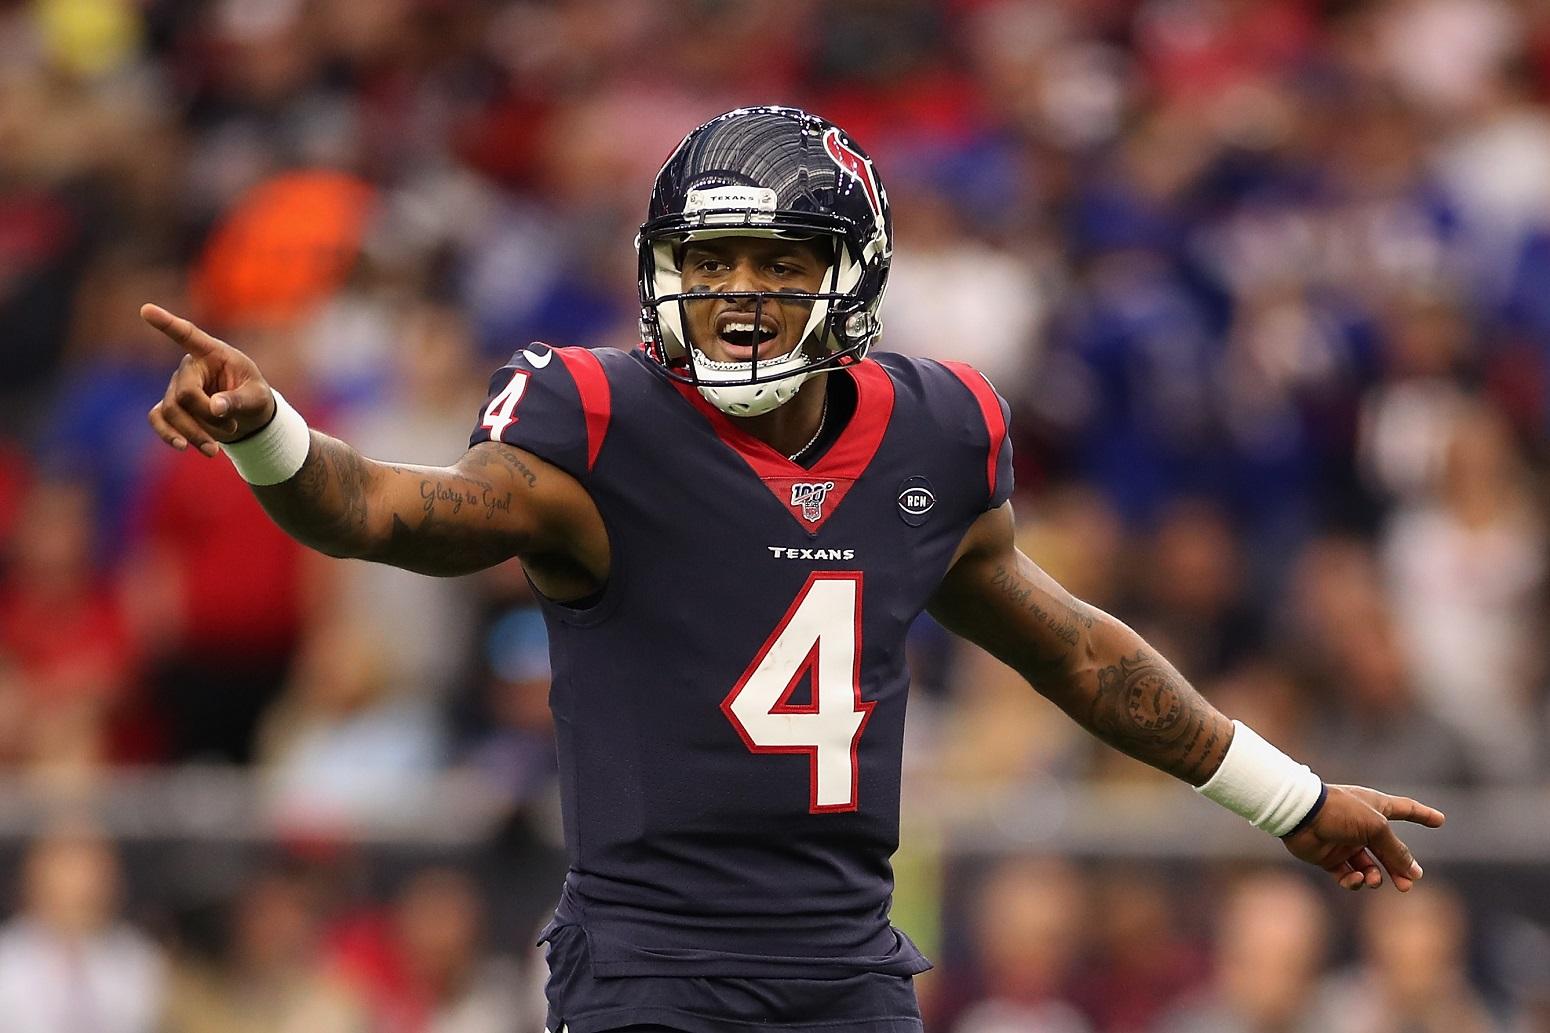 Deshaun Watson Texans NFL future